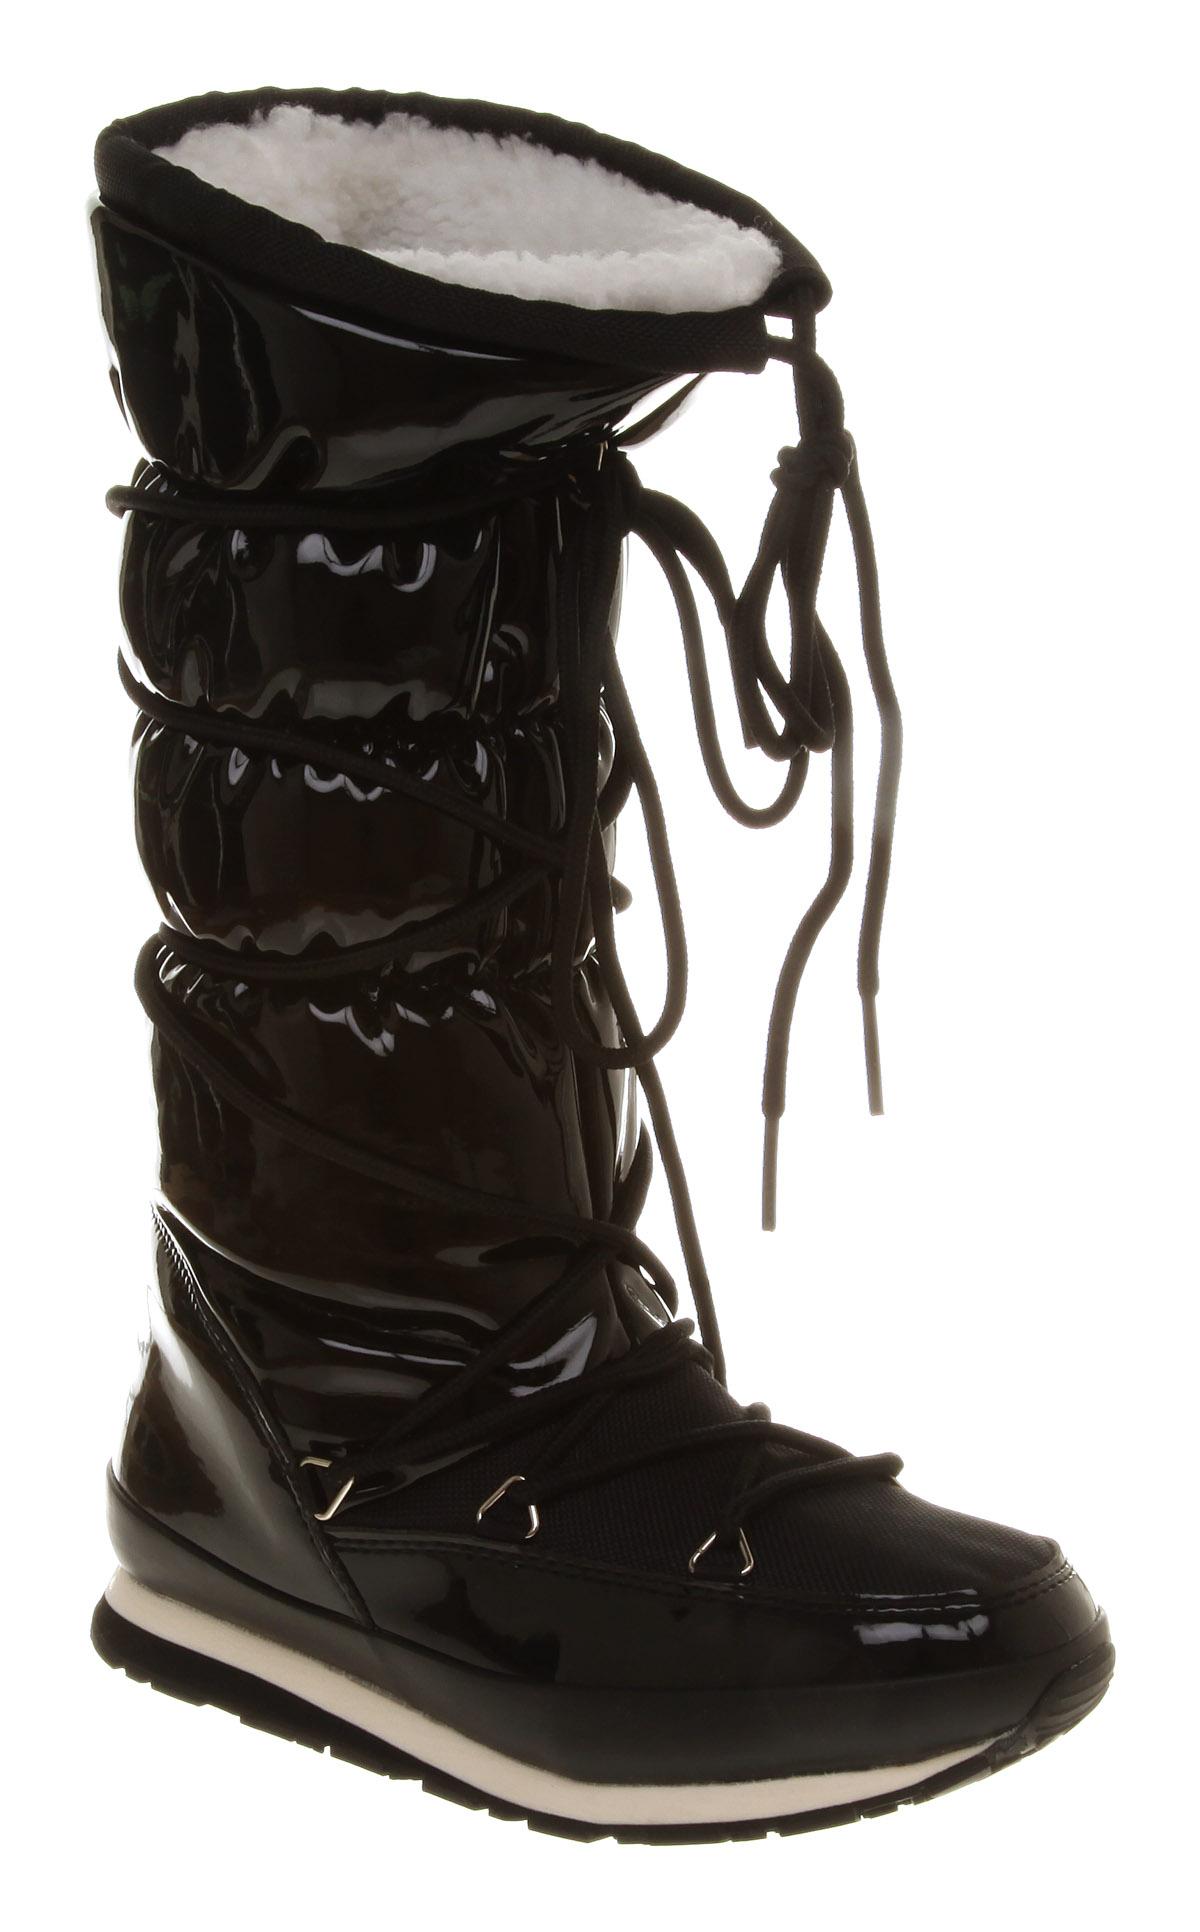 womens rubber duck arctic jogger black shiny pu boots